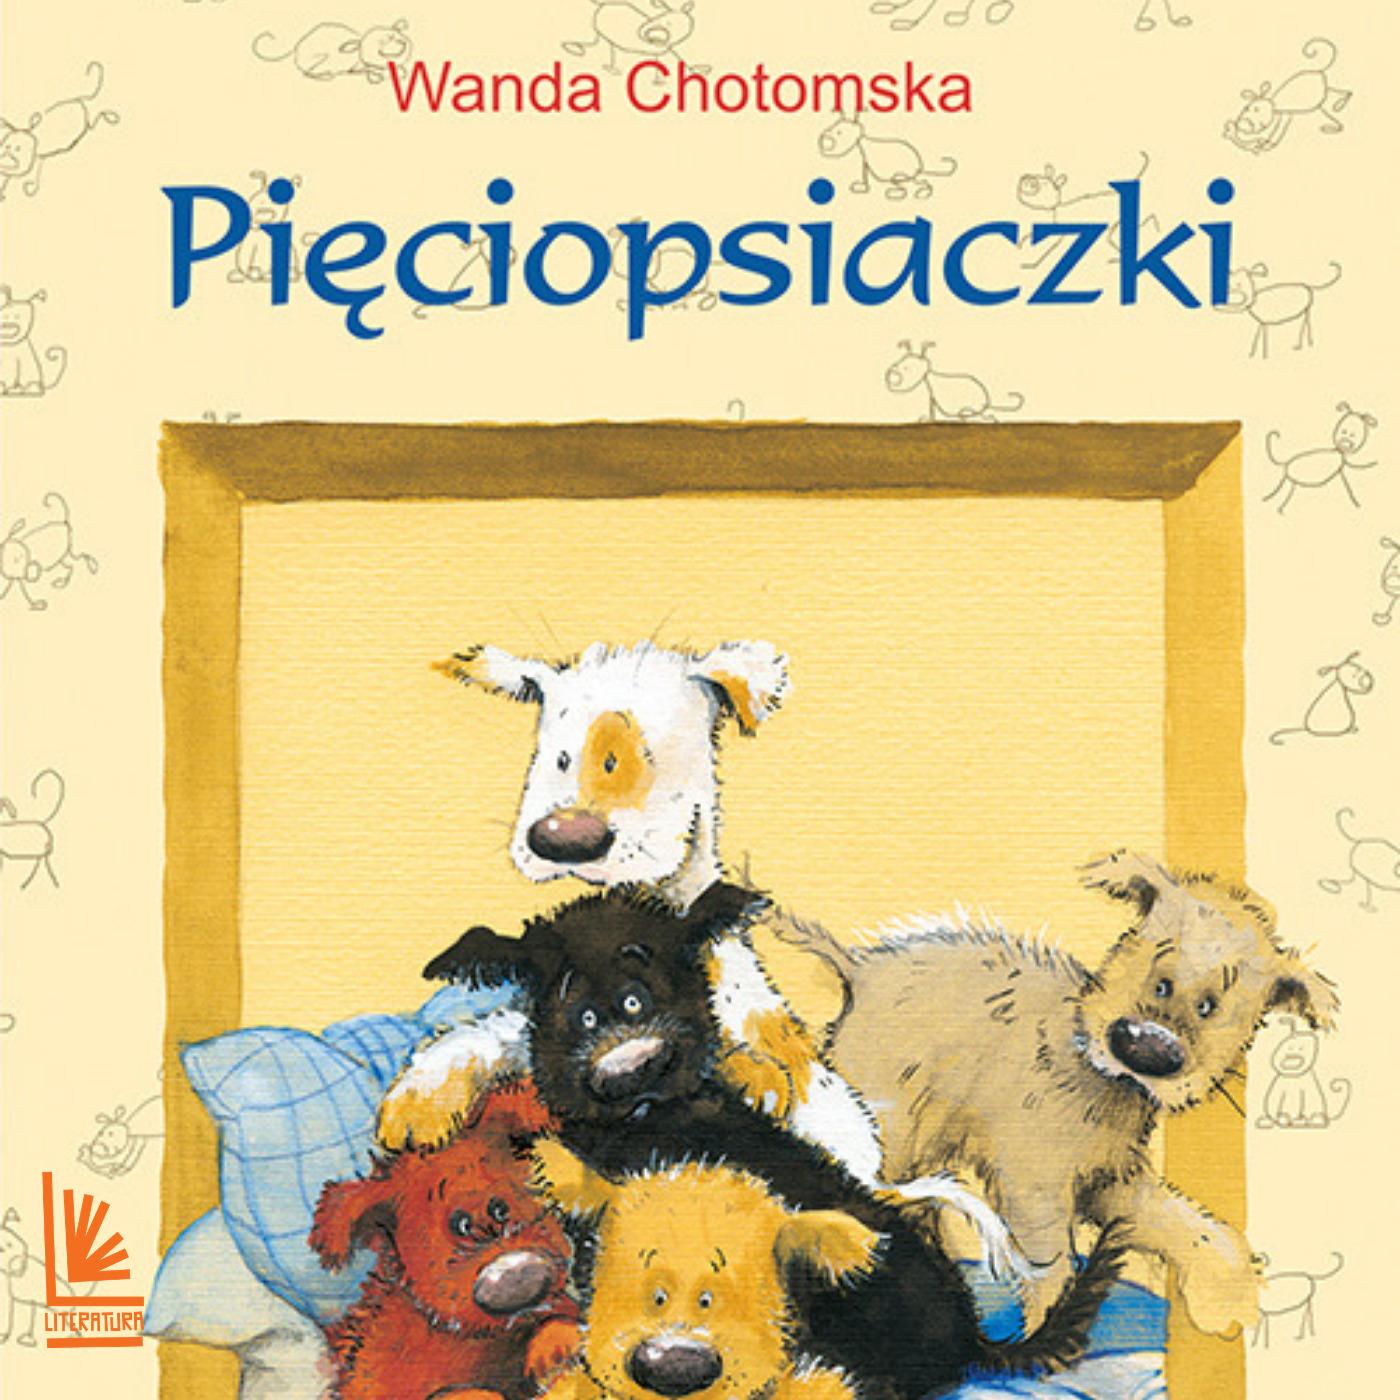 цена на Wanda Chotomska Pięciopsiaczki